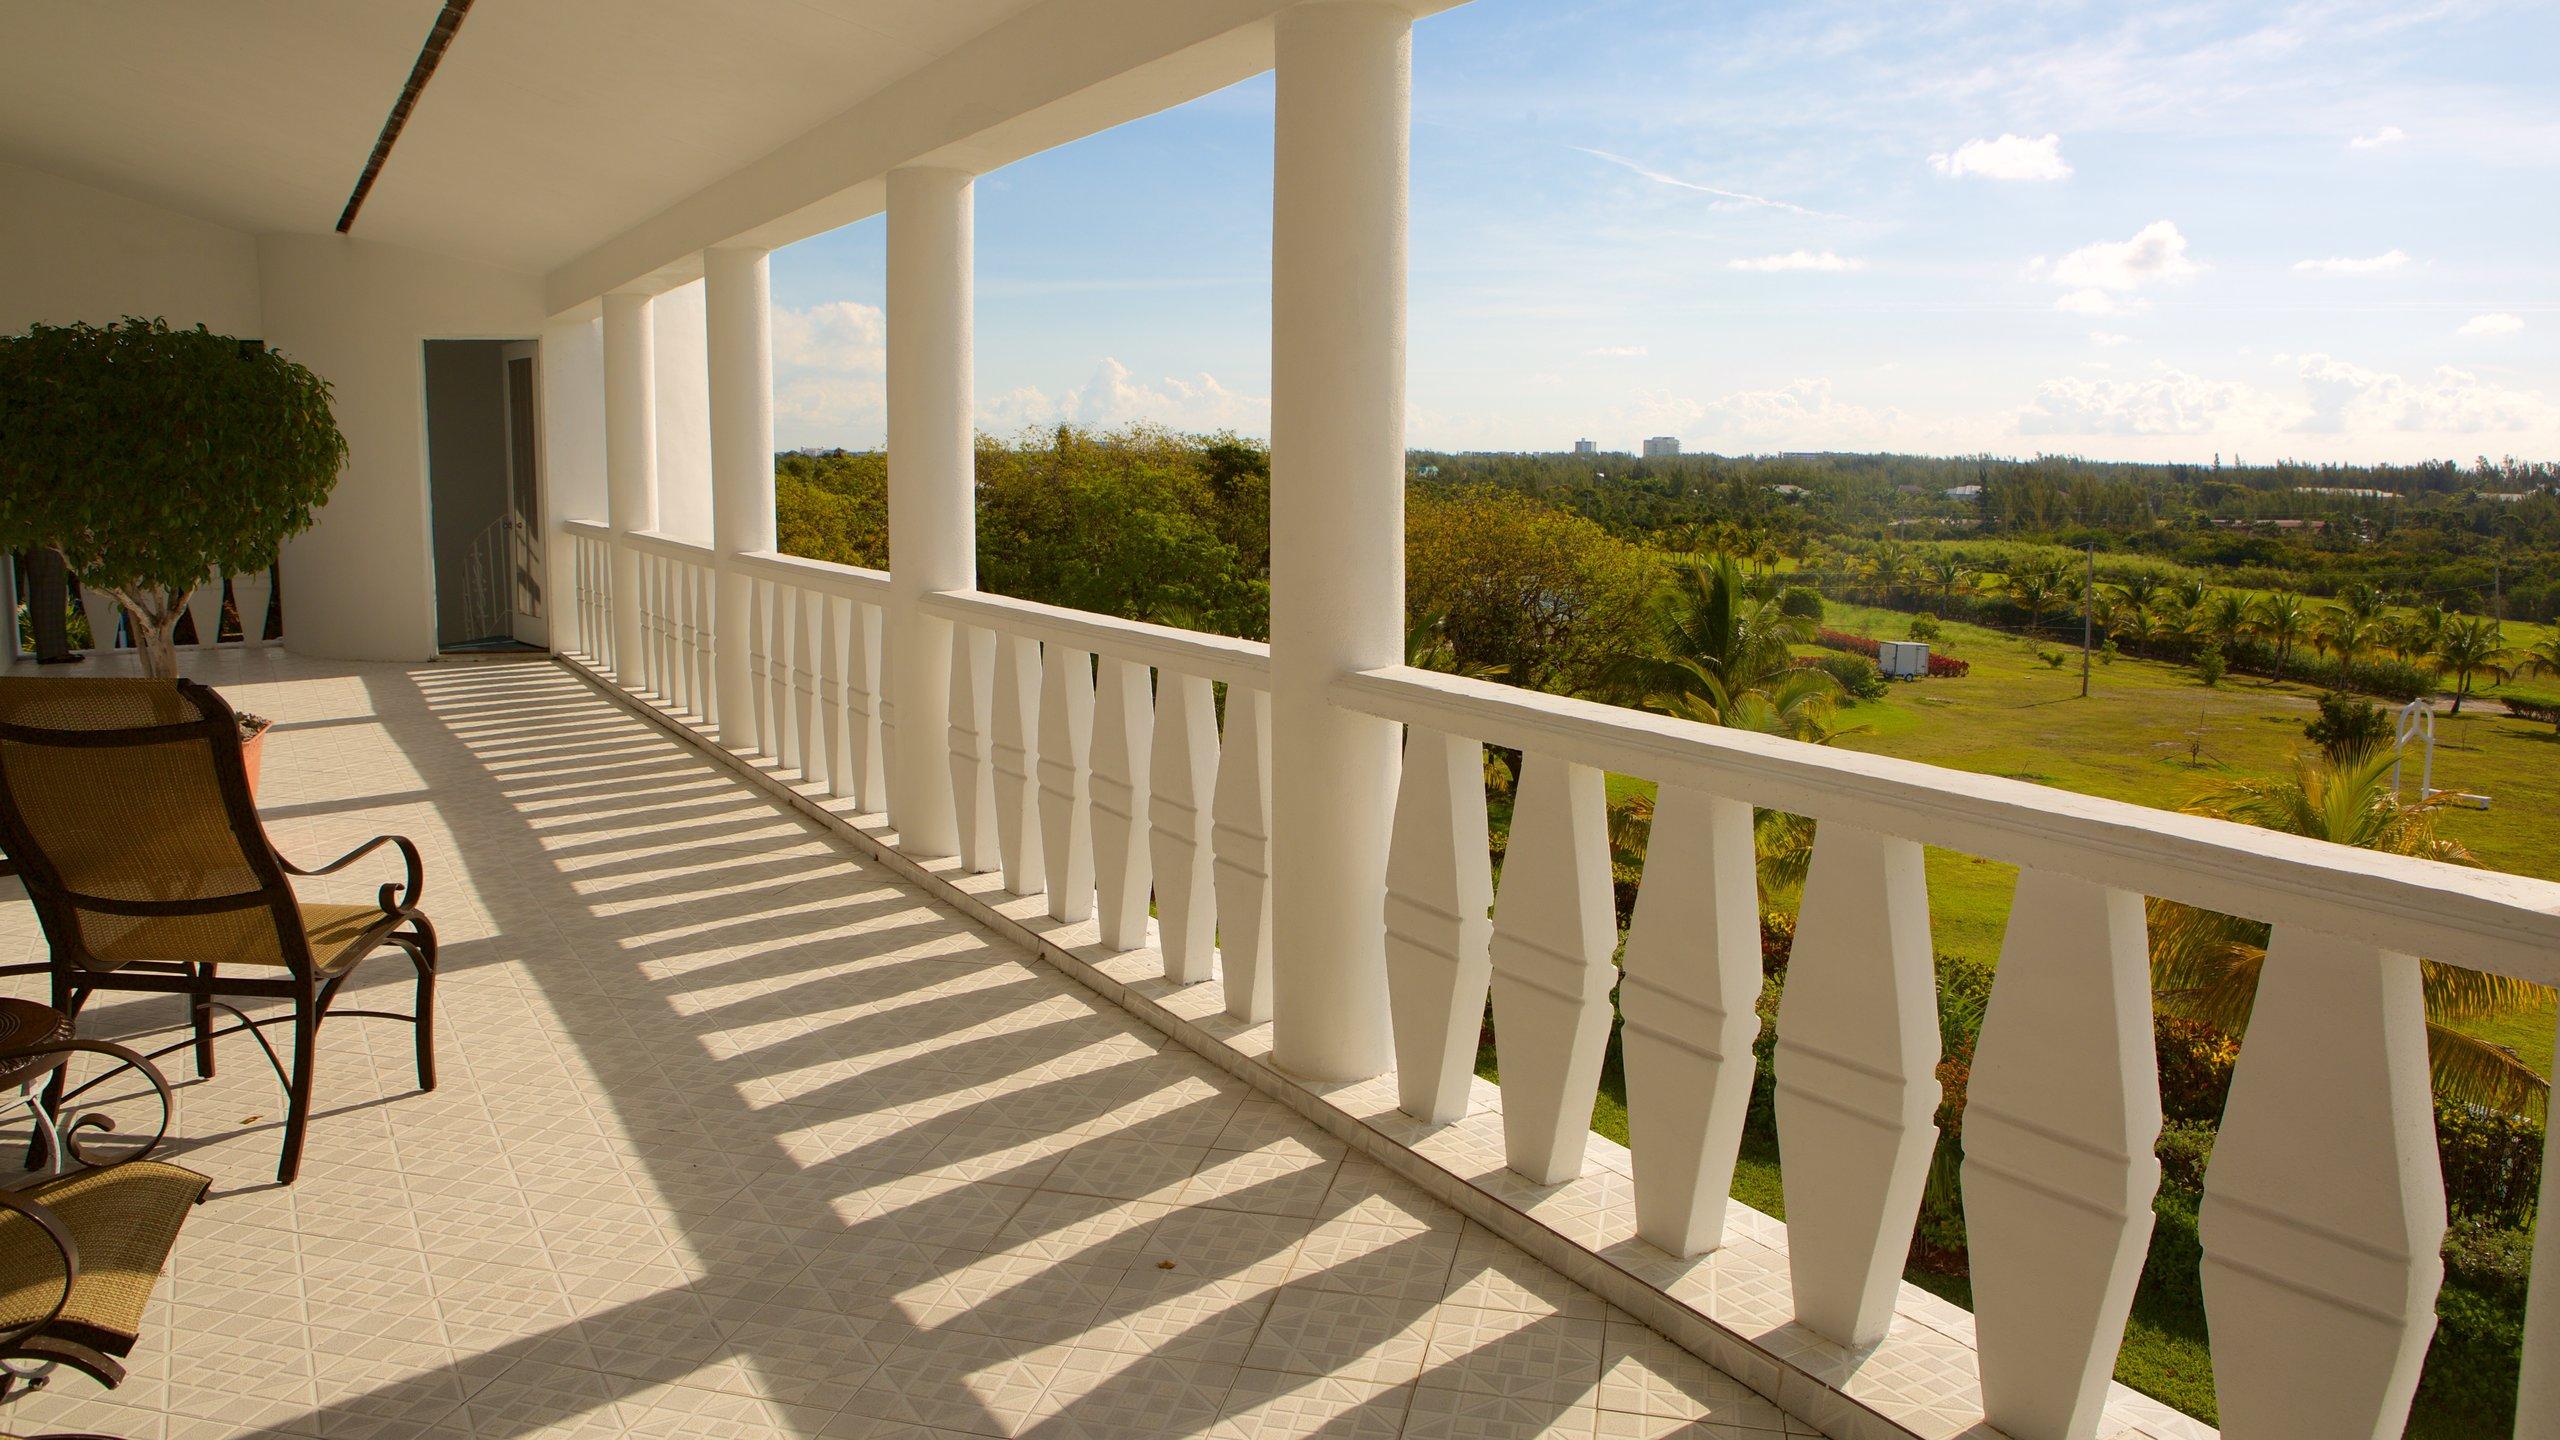 Bahamas Terrace, Freeport, Bahamas